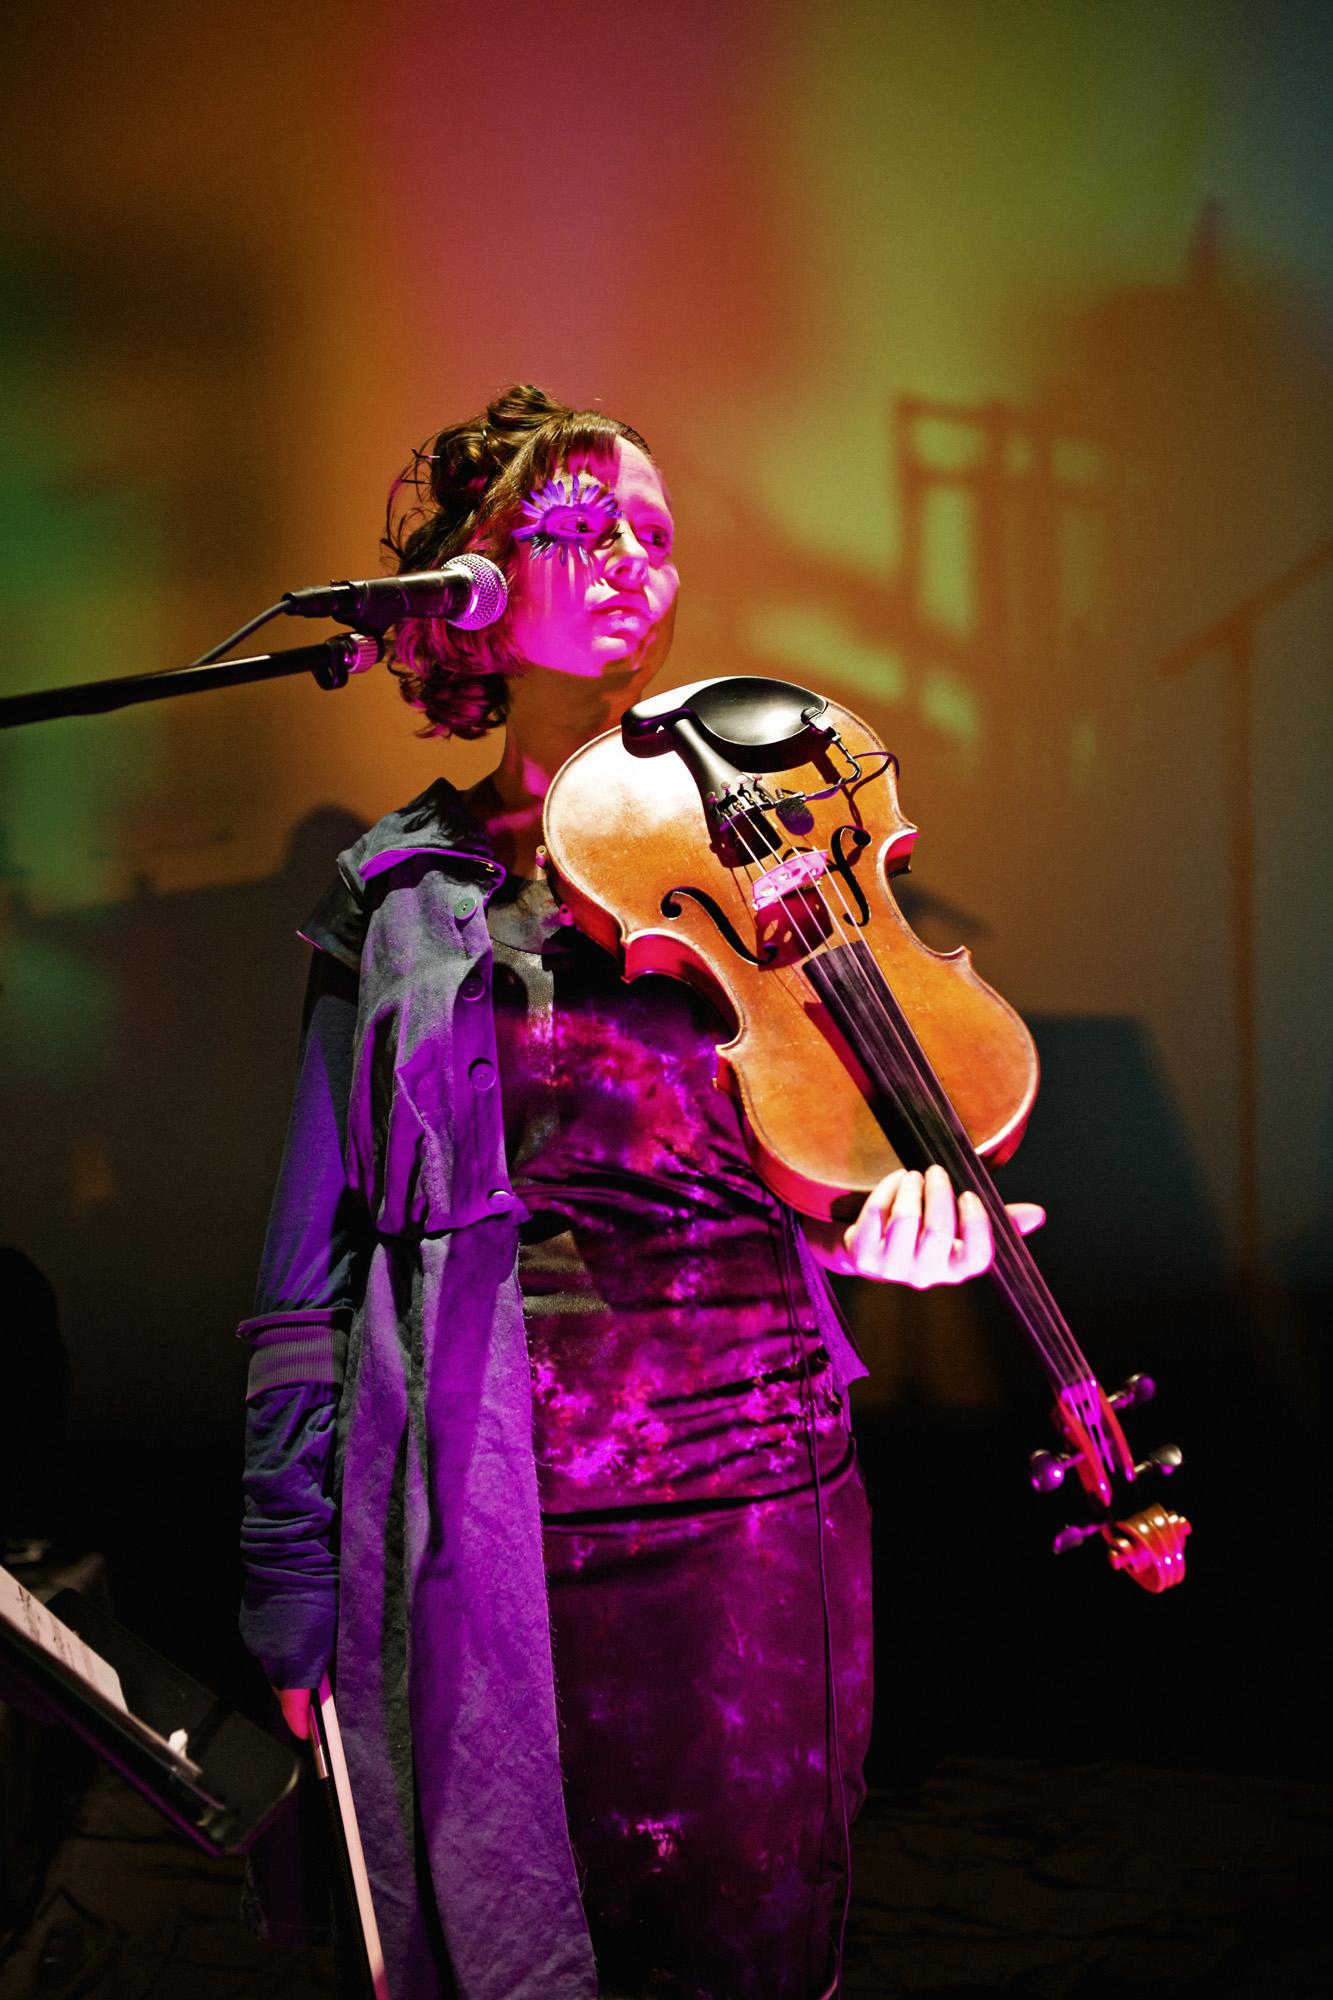 necessary-monsters-carla-kihlstedt-rinde-eckert-allen-willner-violin.jpg